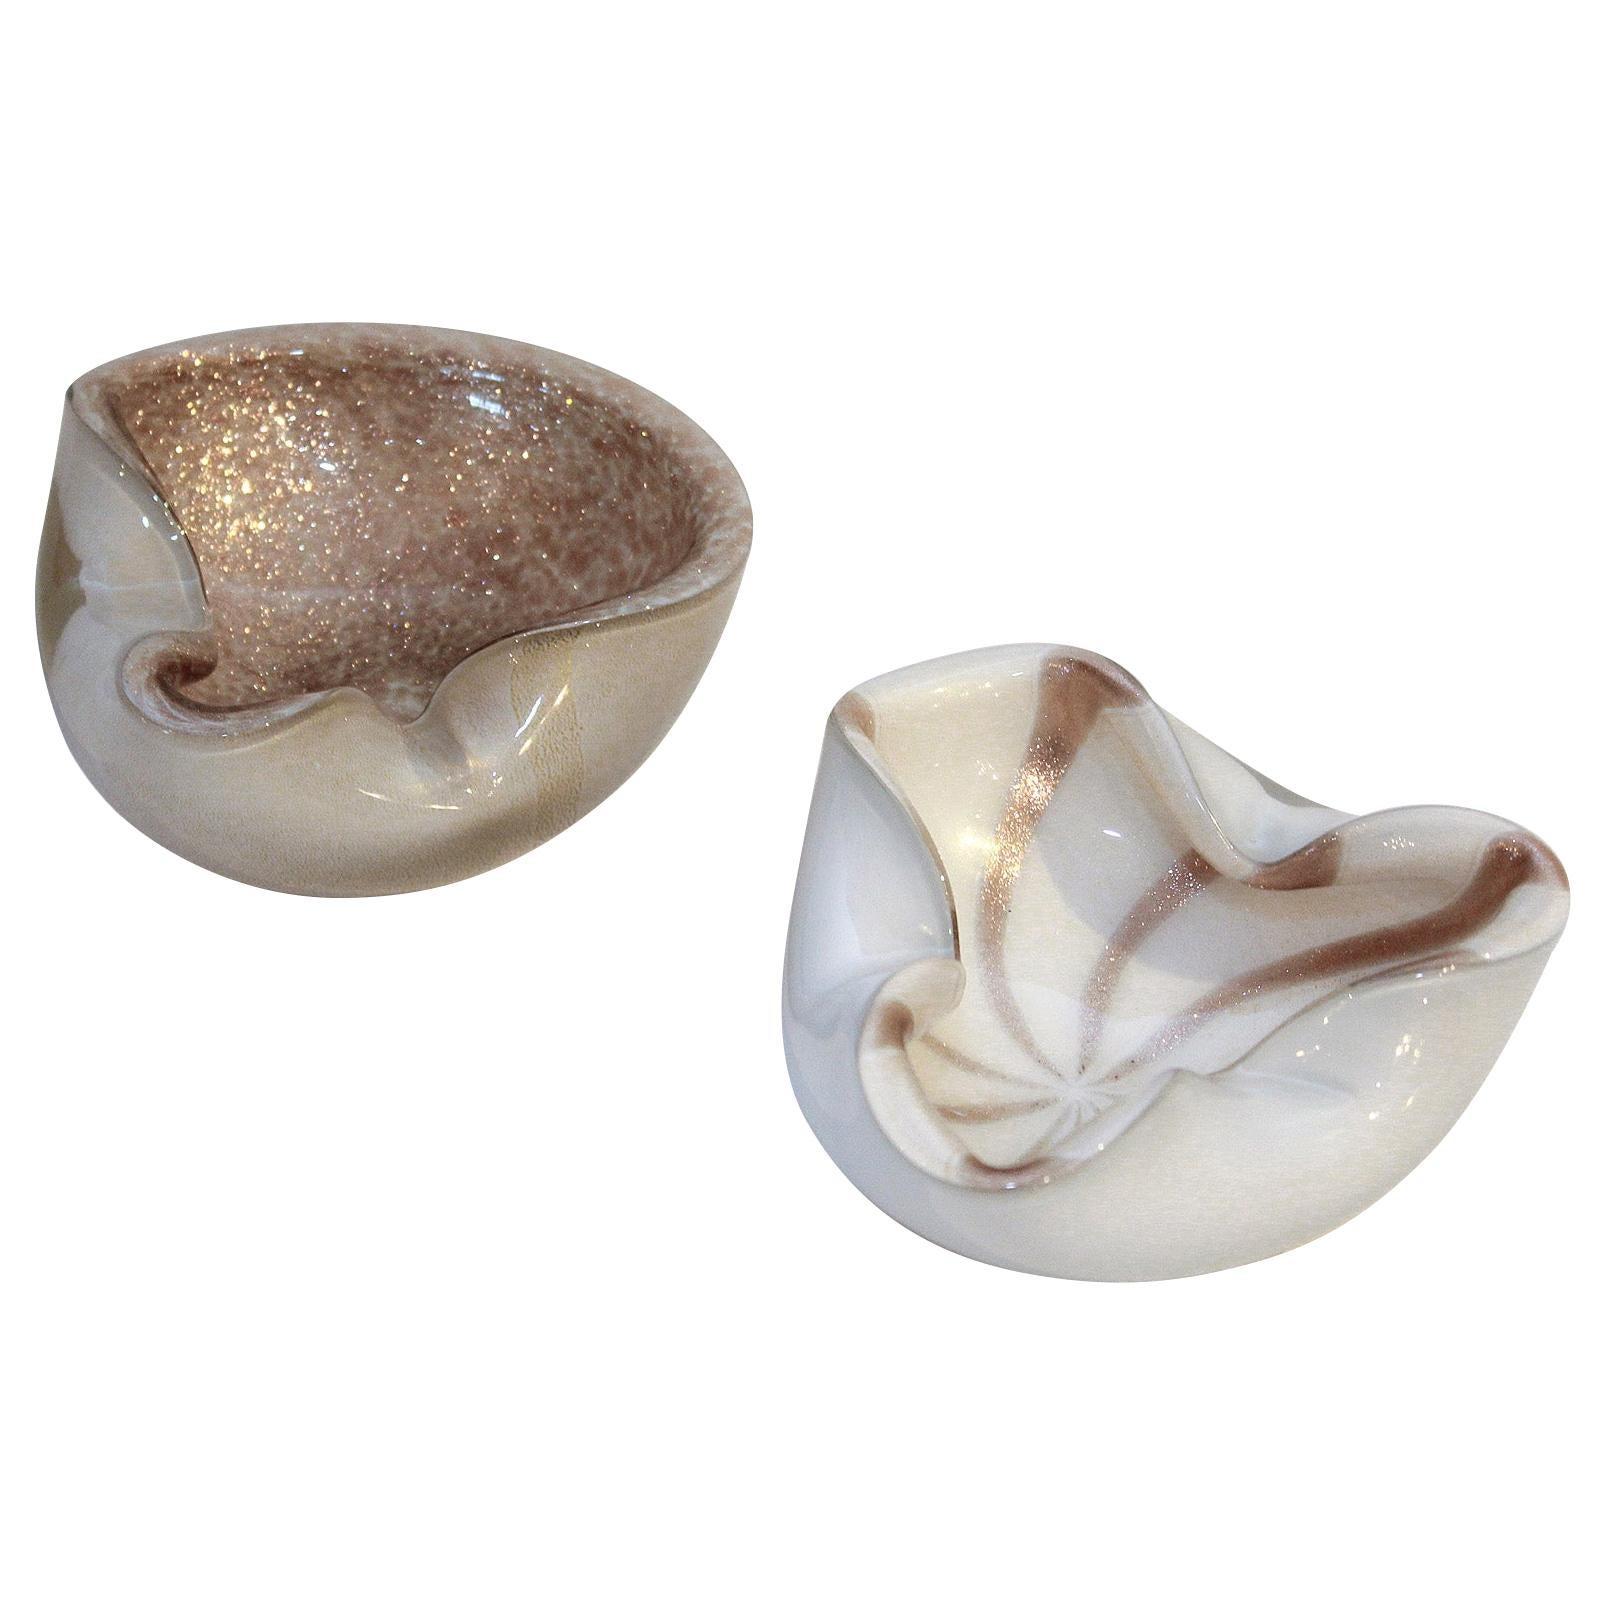 1950s Murano Art Glass Aventurine Bowls or Ashtrays by Alfredo Barbini, Italy